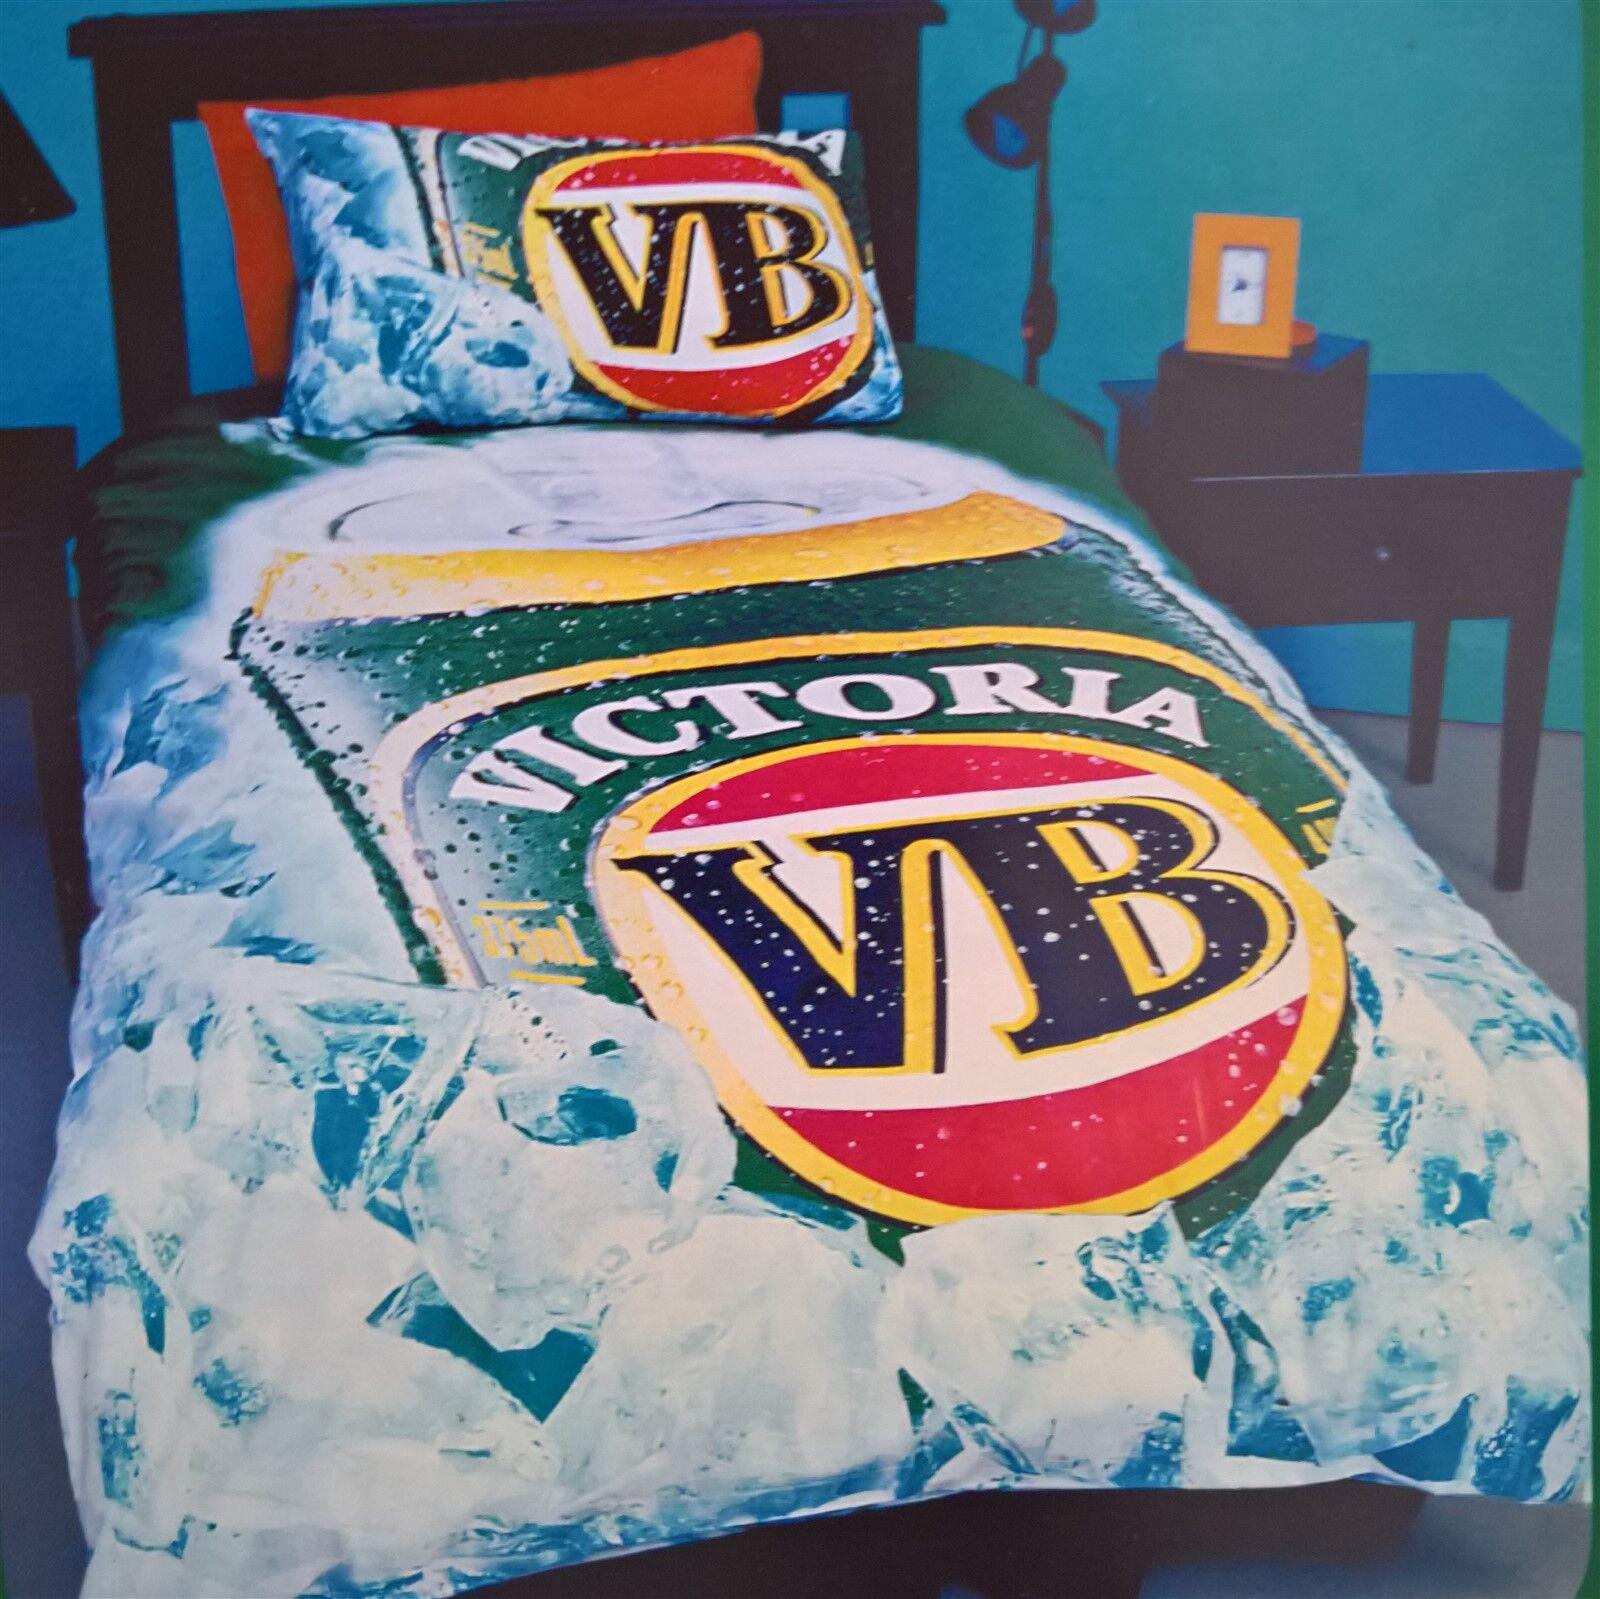 VB Victoria Bitter - DOONA   QUILT   DUVET COVER ICE